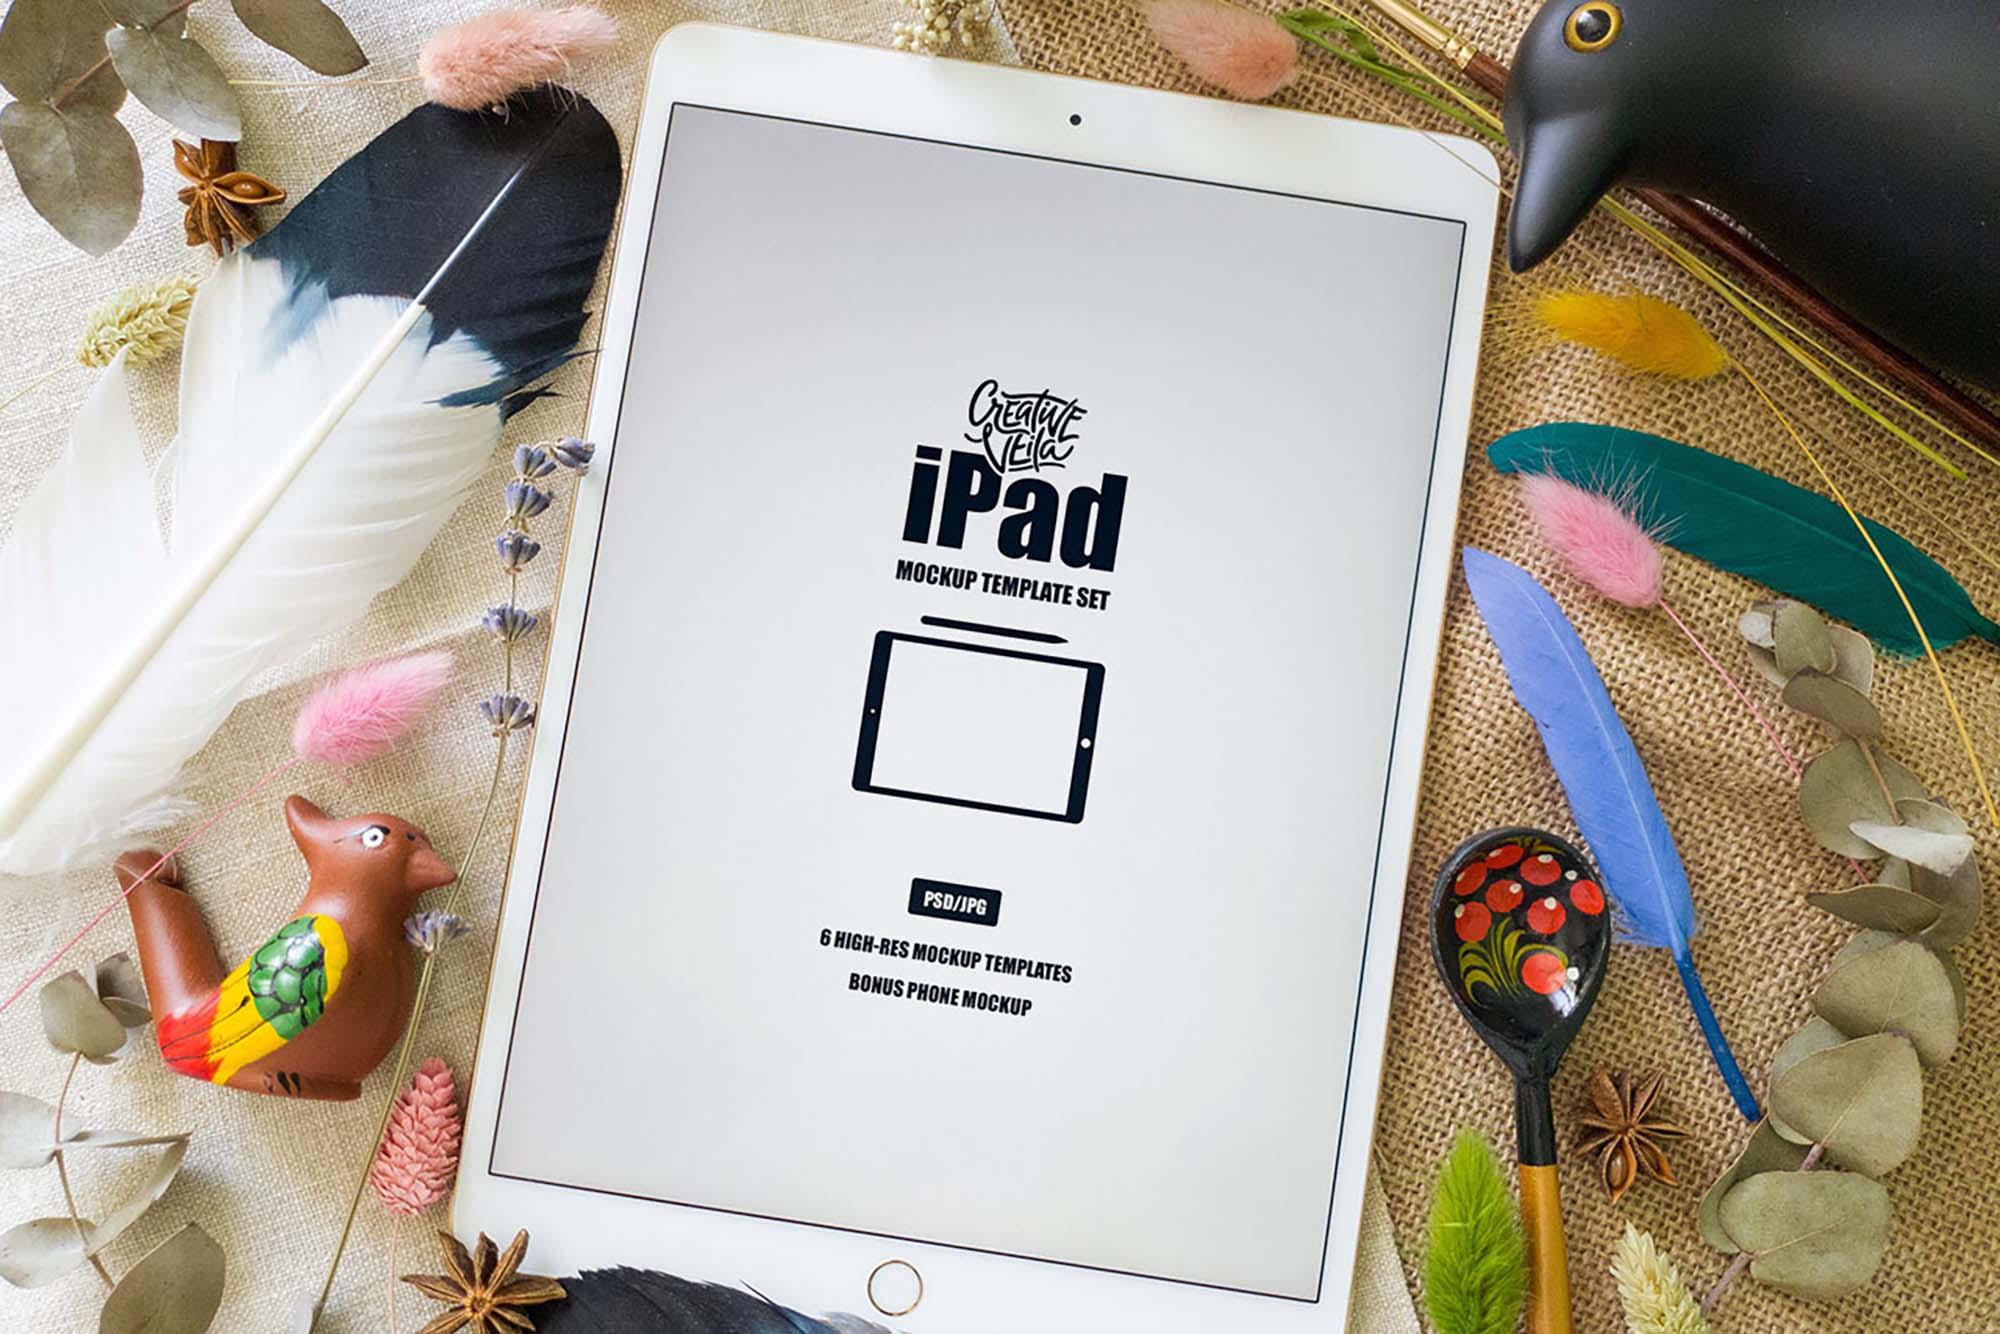 iPad Mockup Template 1